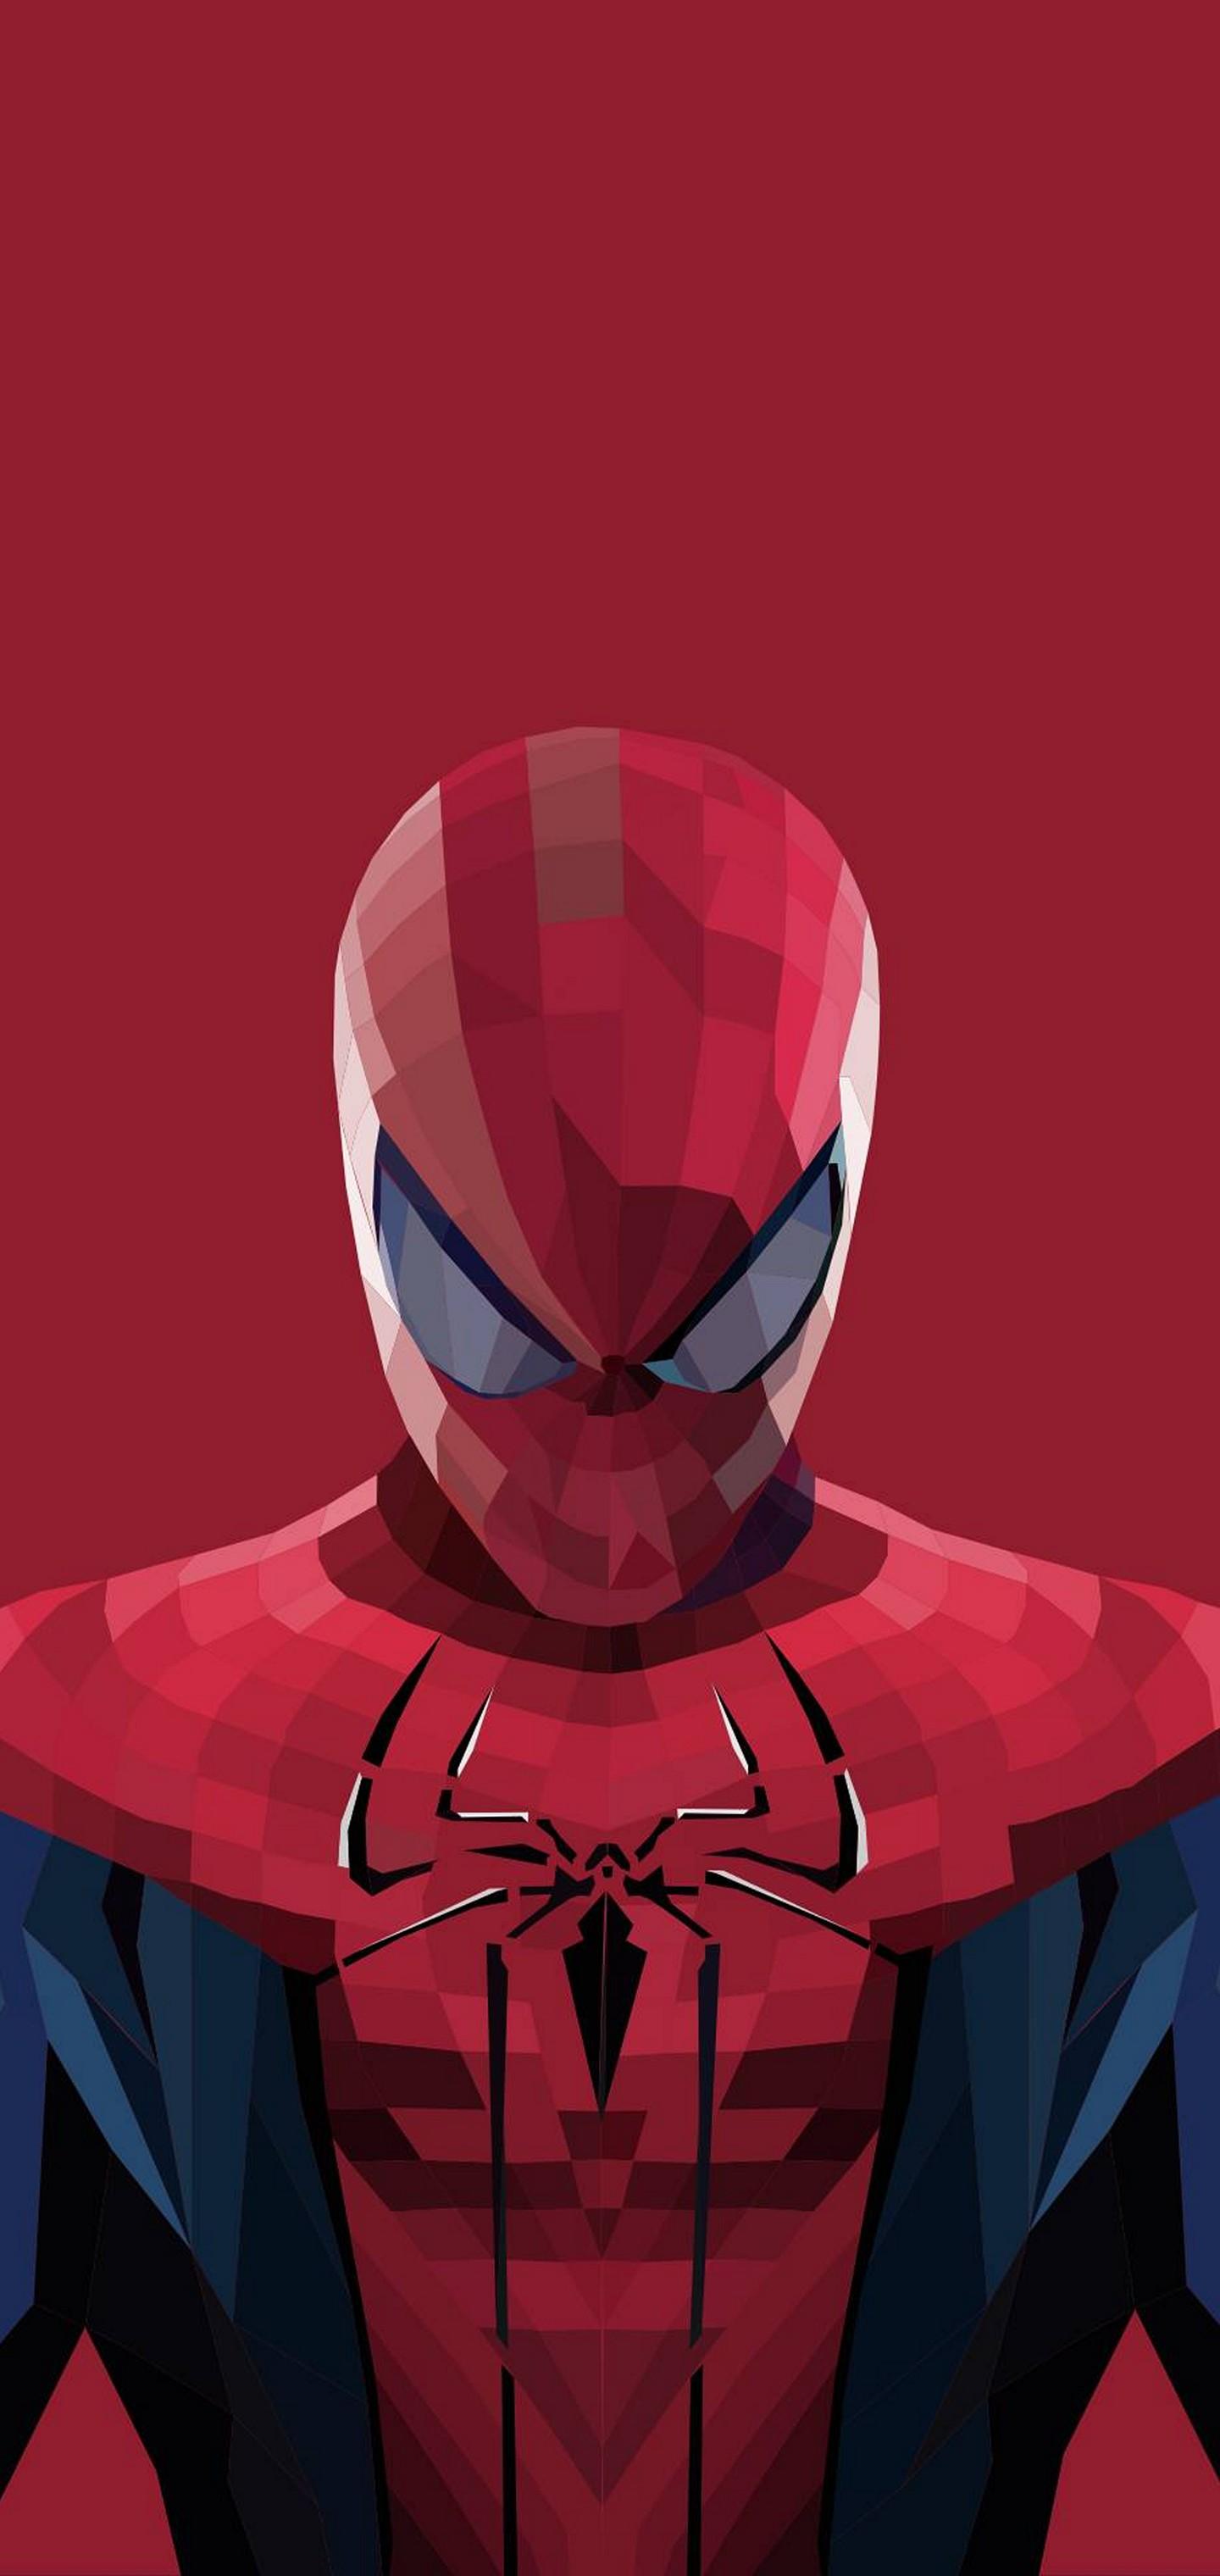 Superhero Spiderman Cartoon Wallpaper 1440x3040